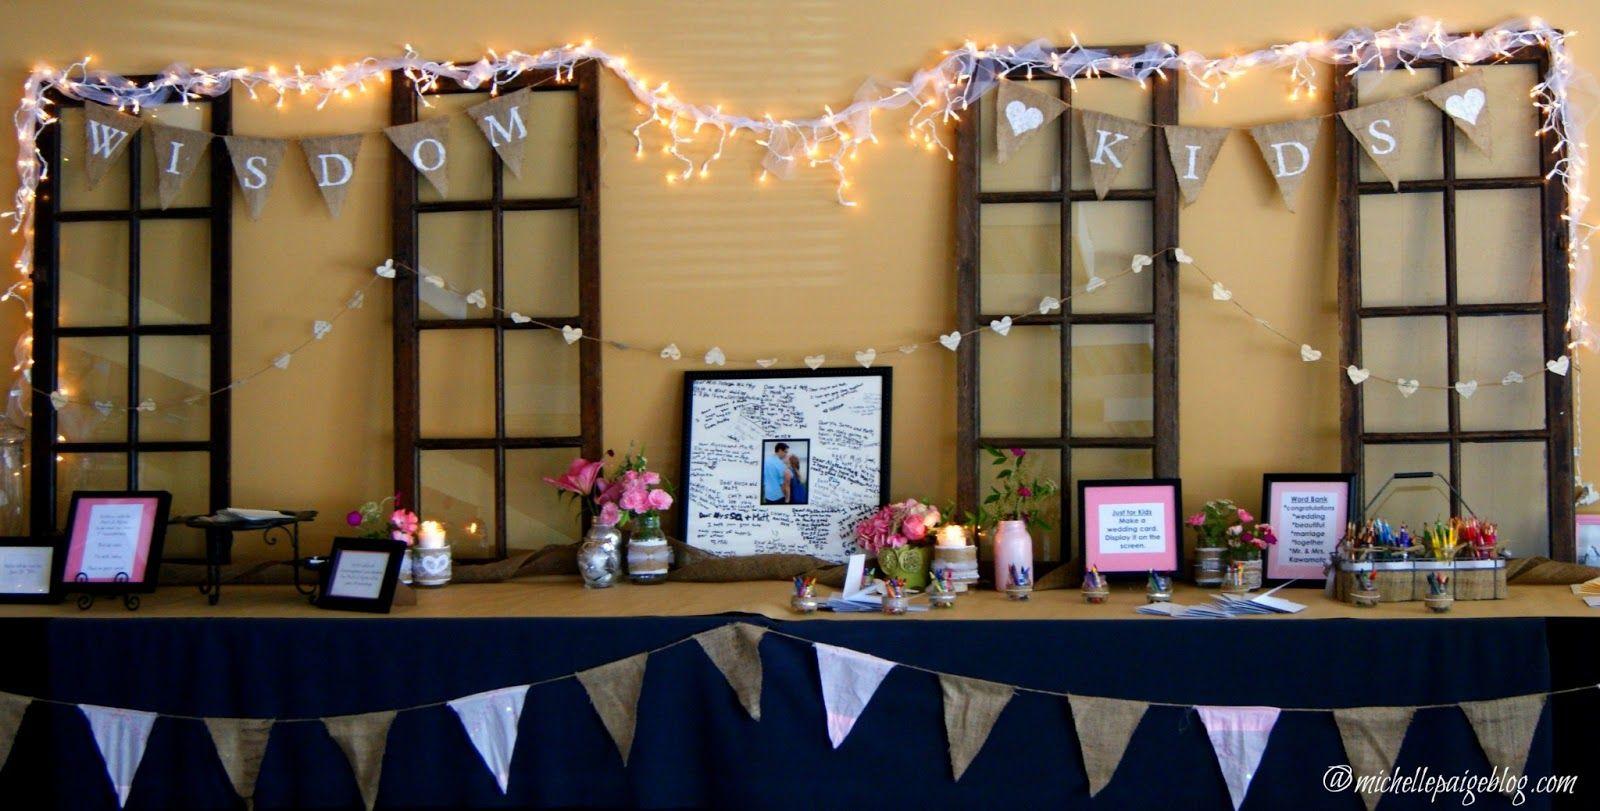 wedding+back+wall+banners.jpg (1600×811)